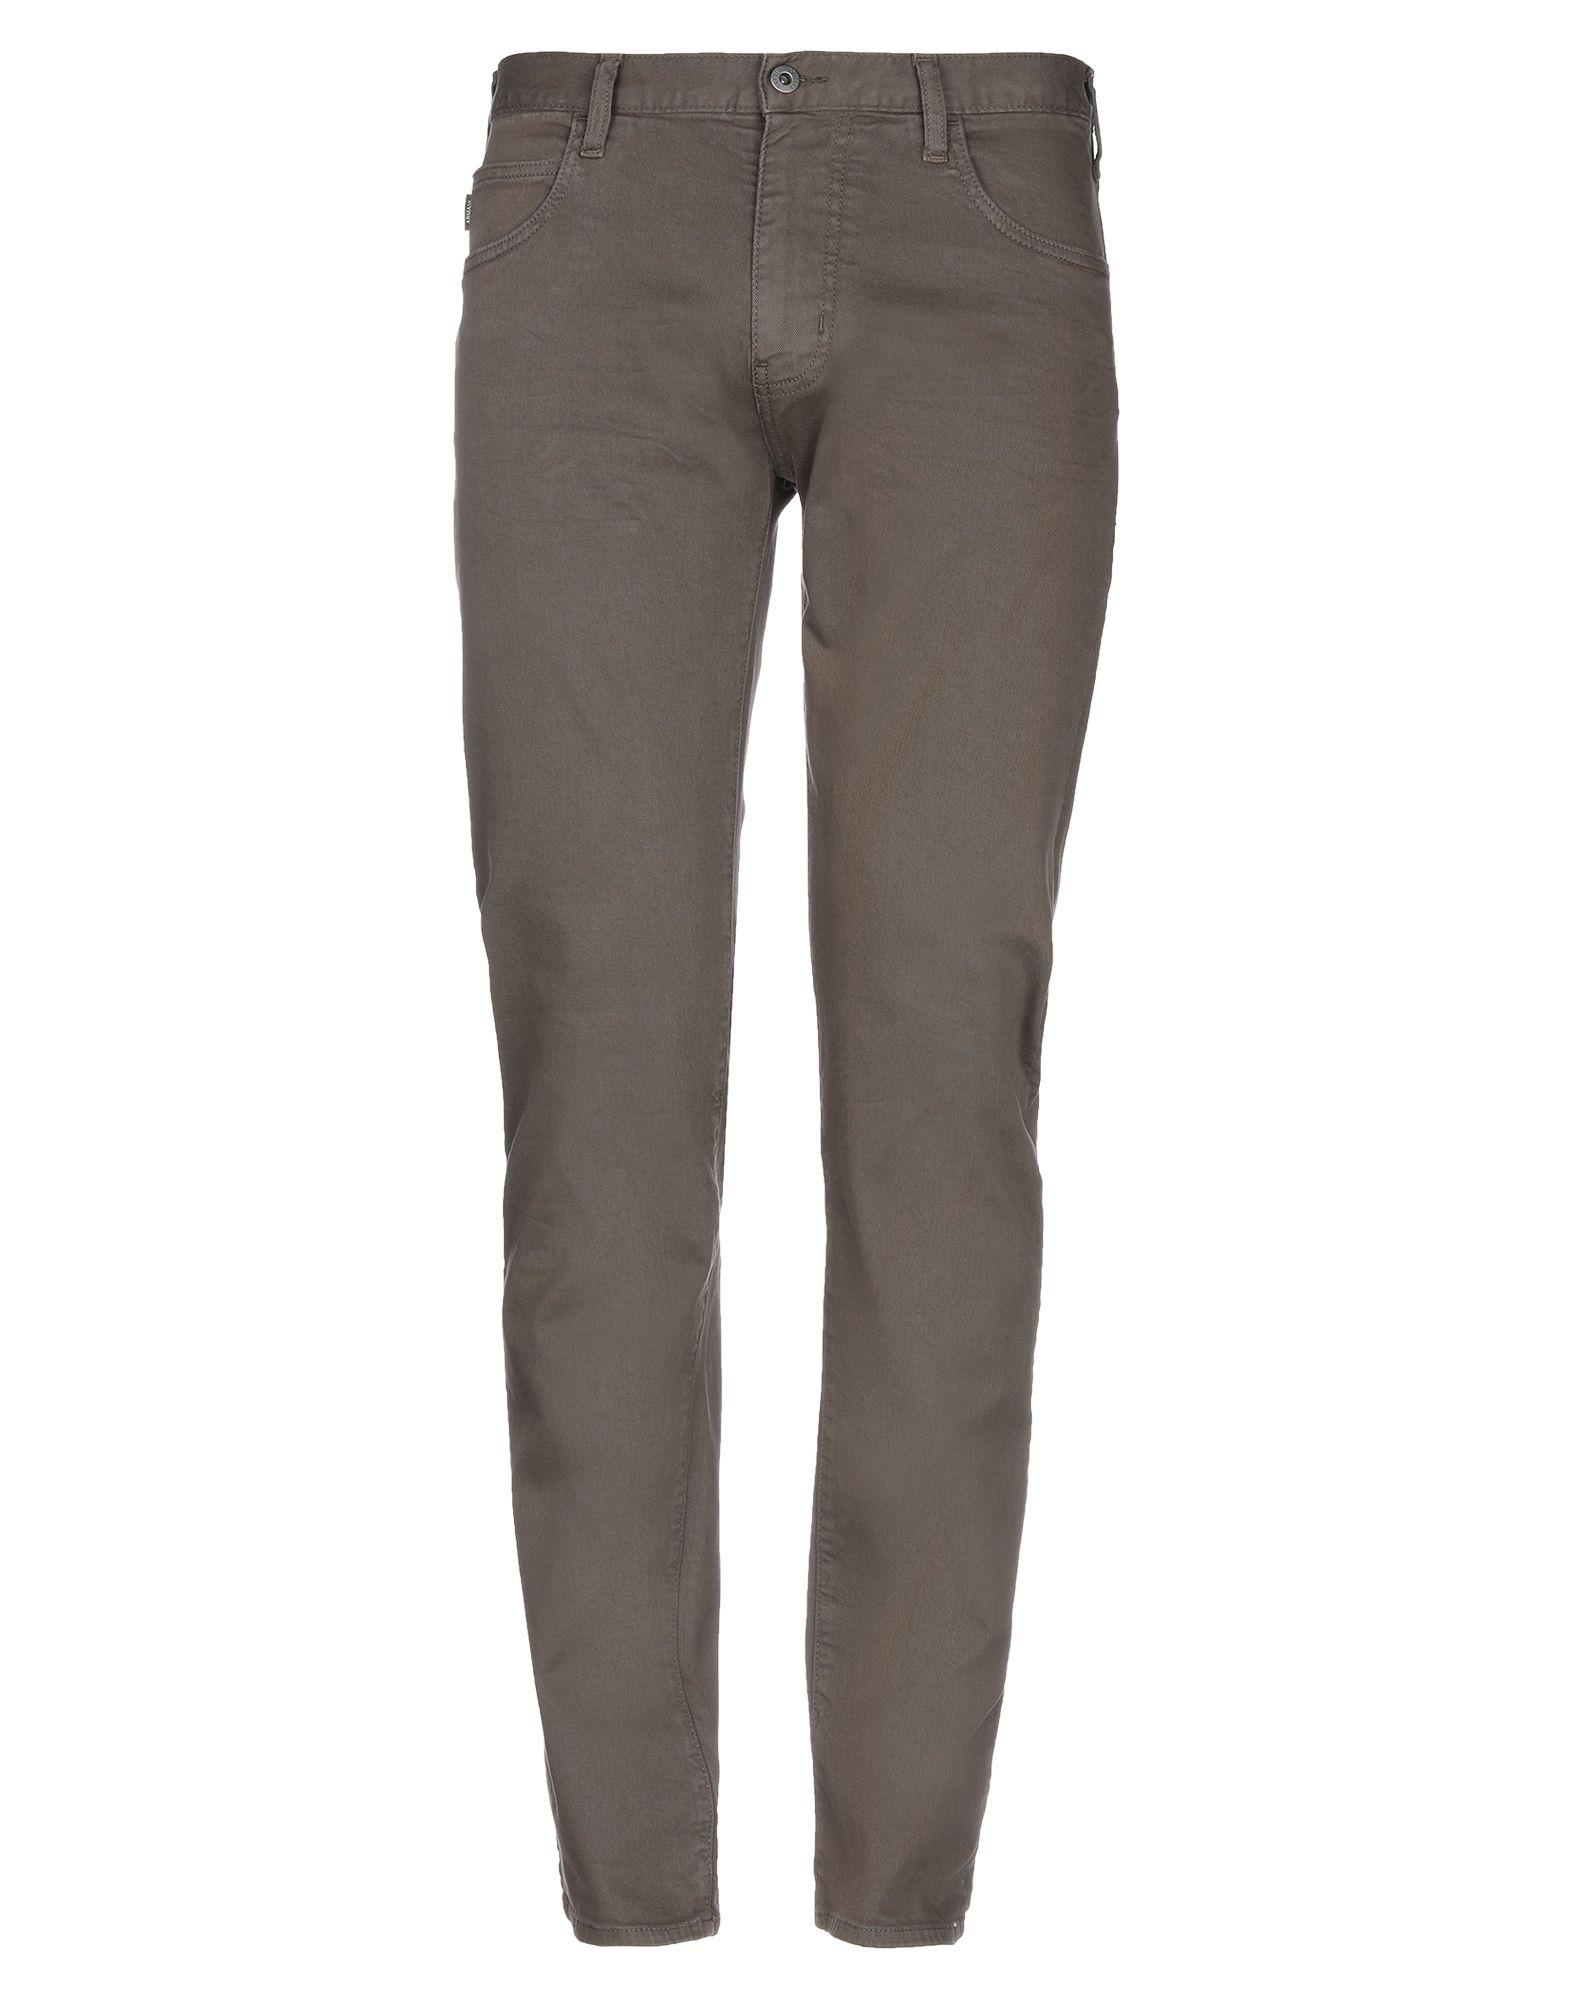 Pantaloni Jeans Armani Jeans uomo uomo uomo - 42759001IJ 6d5